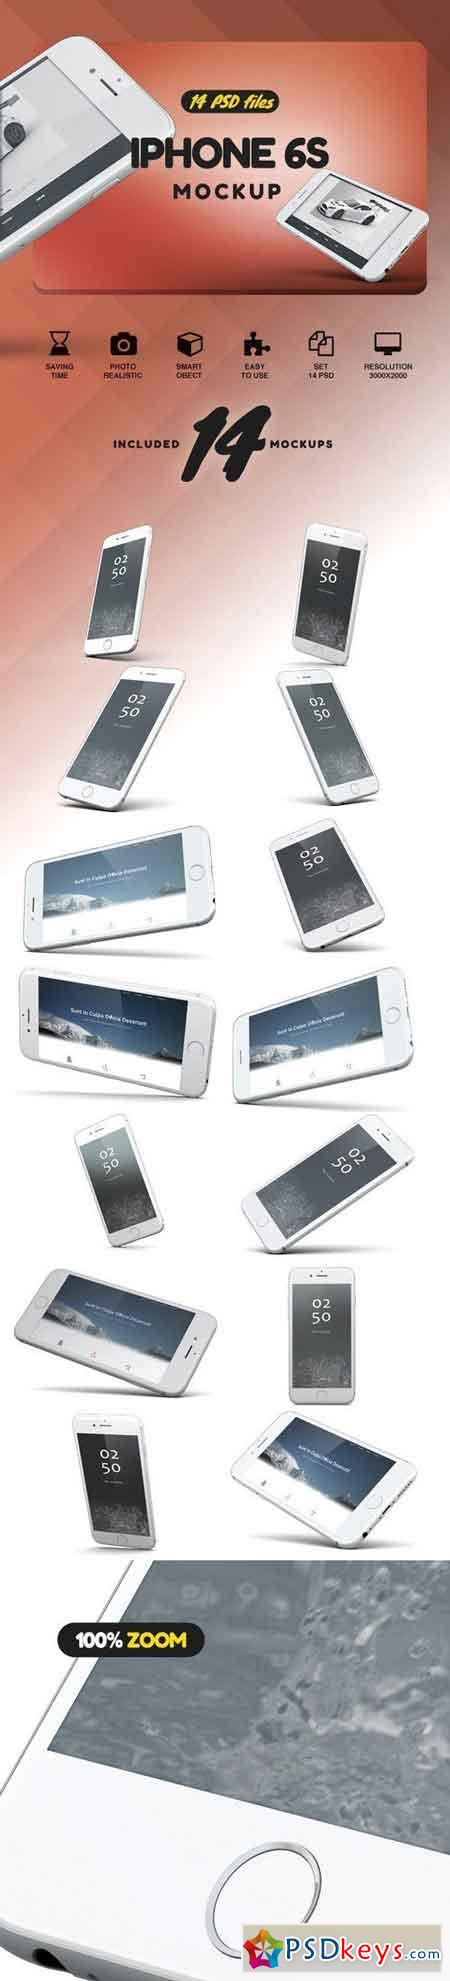 iPhone 6S Mockup 2019906